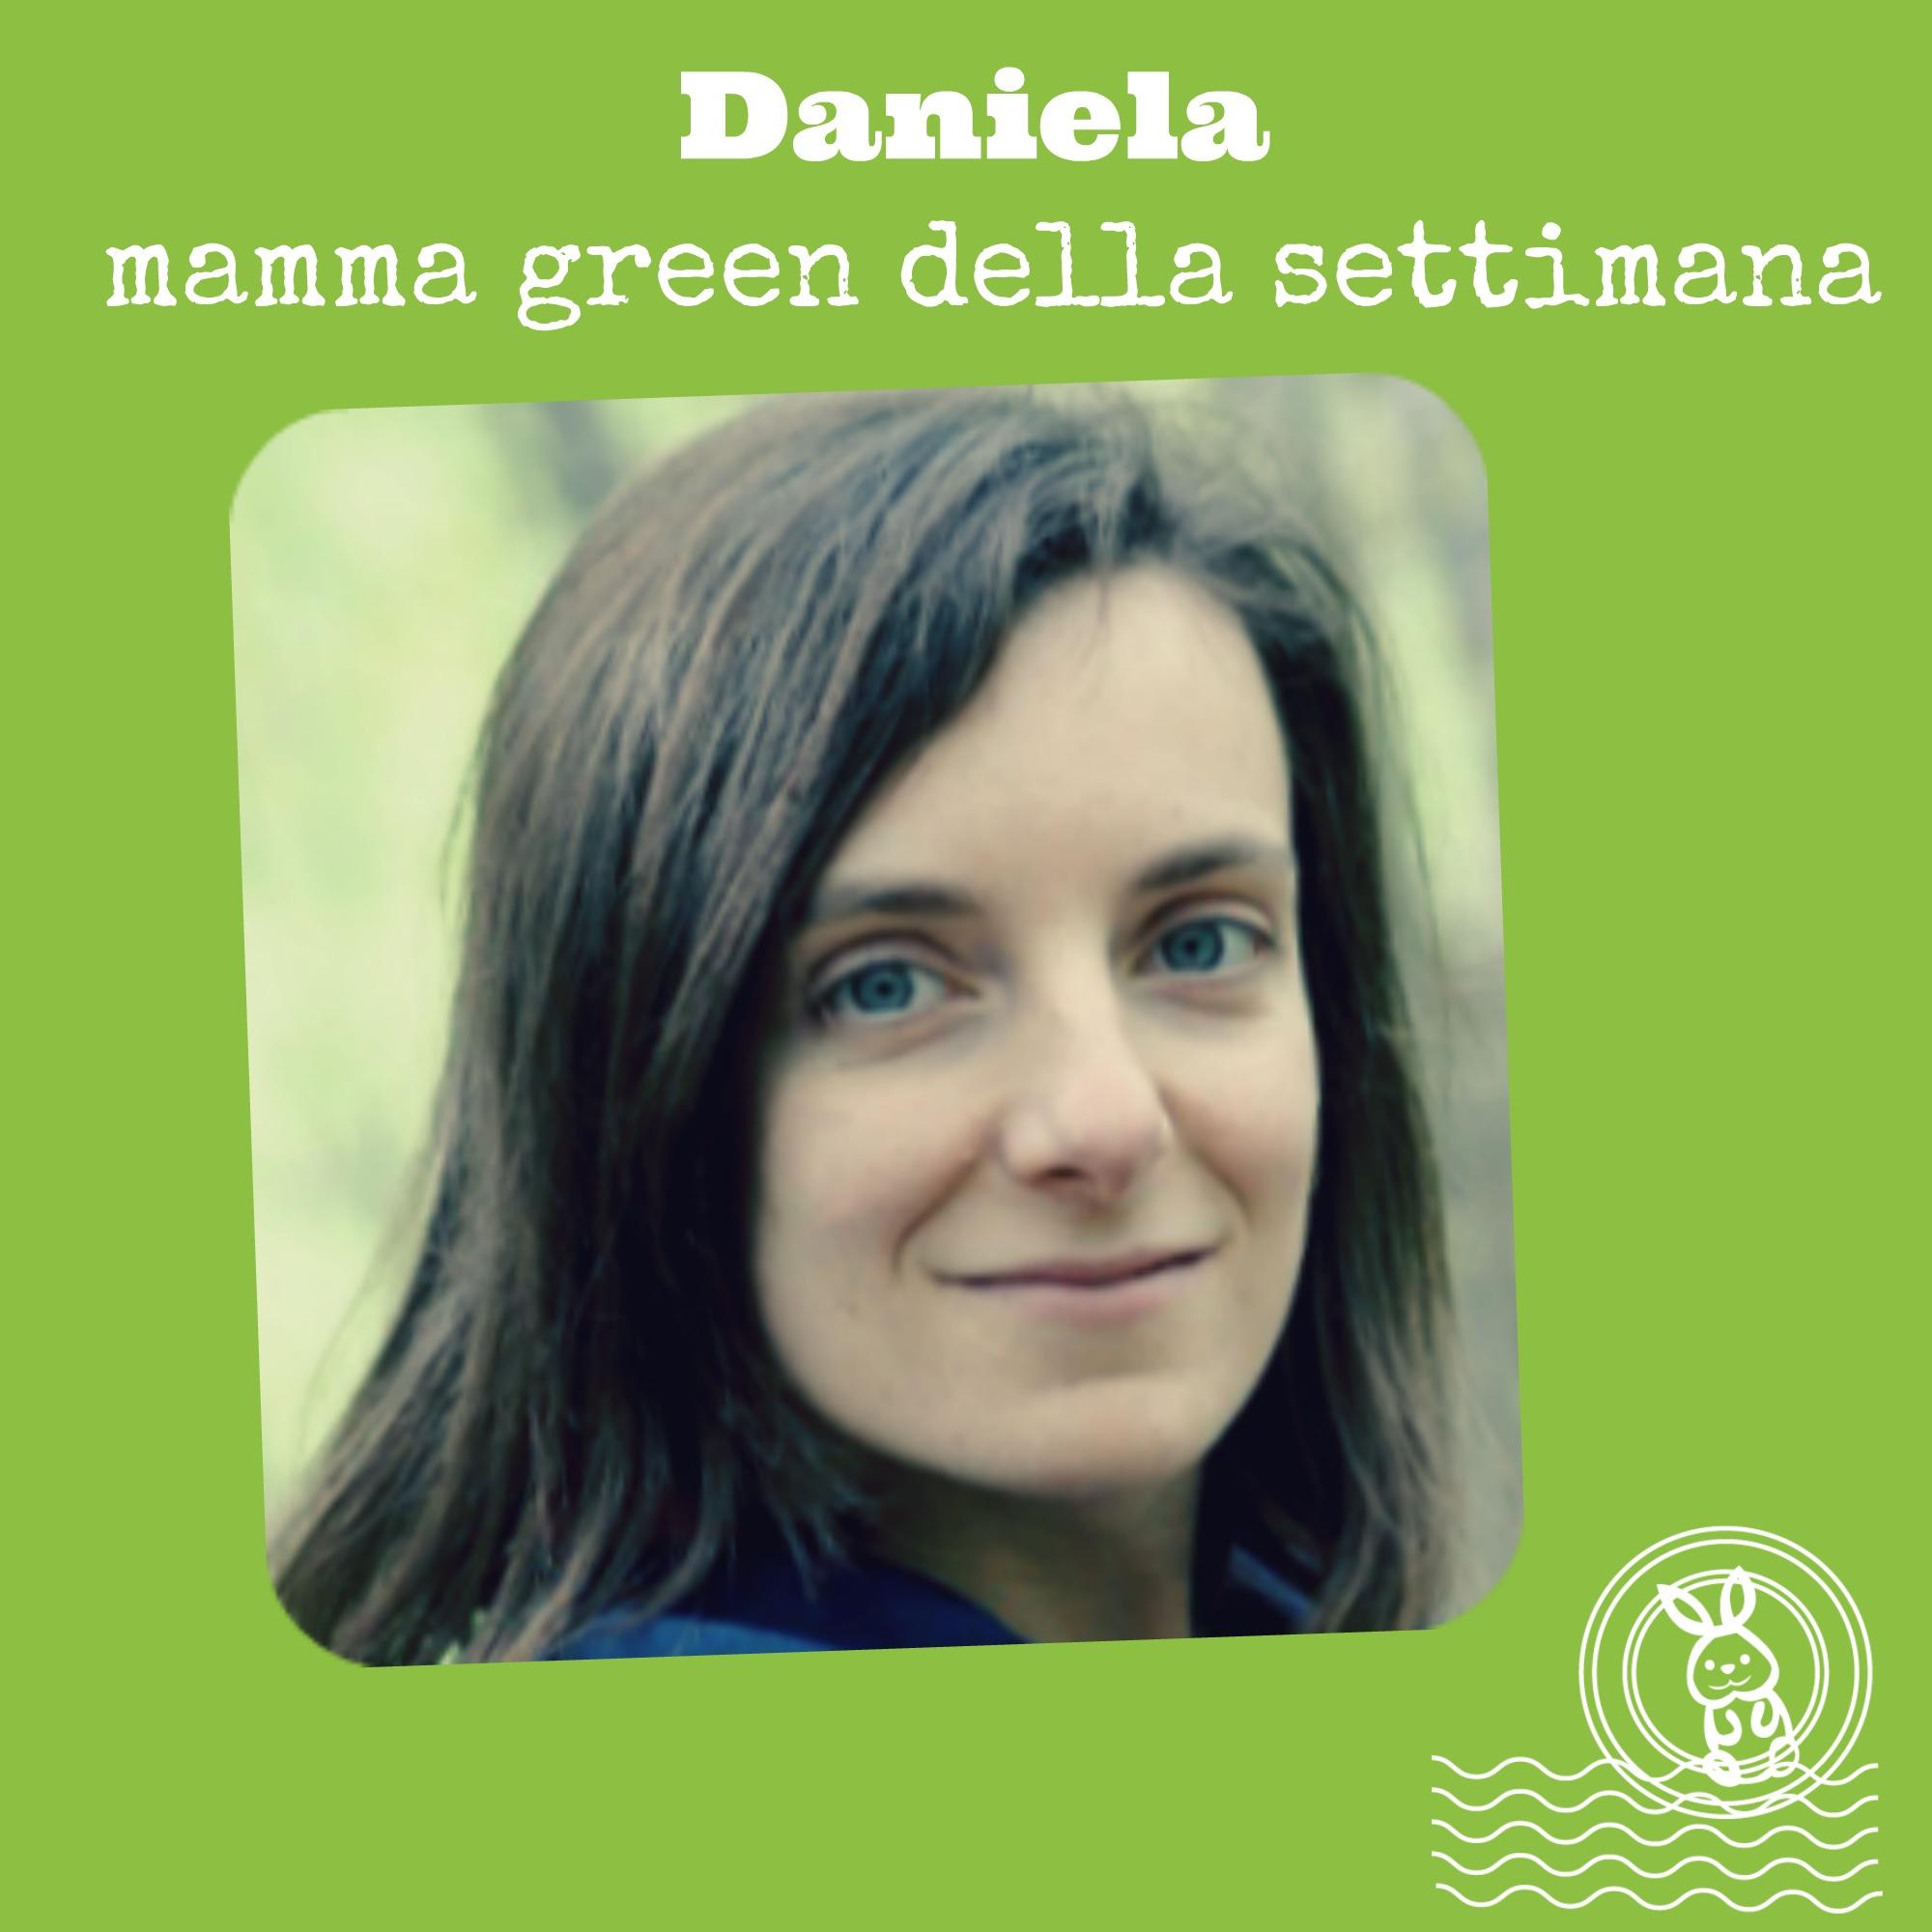 DANIELA_MAMMA_GREEN